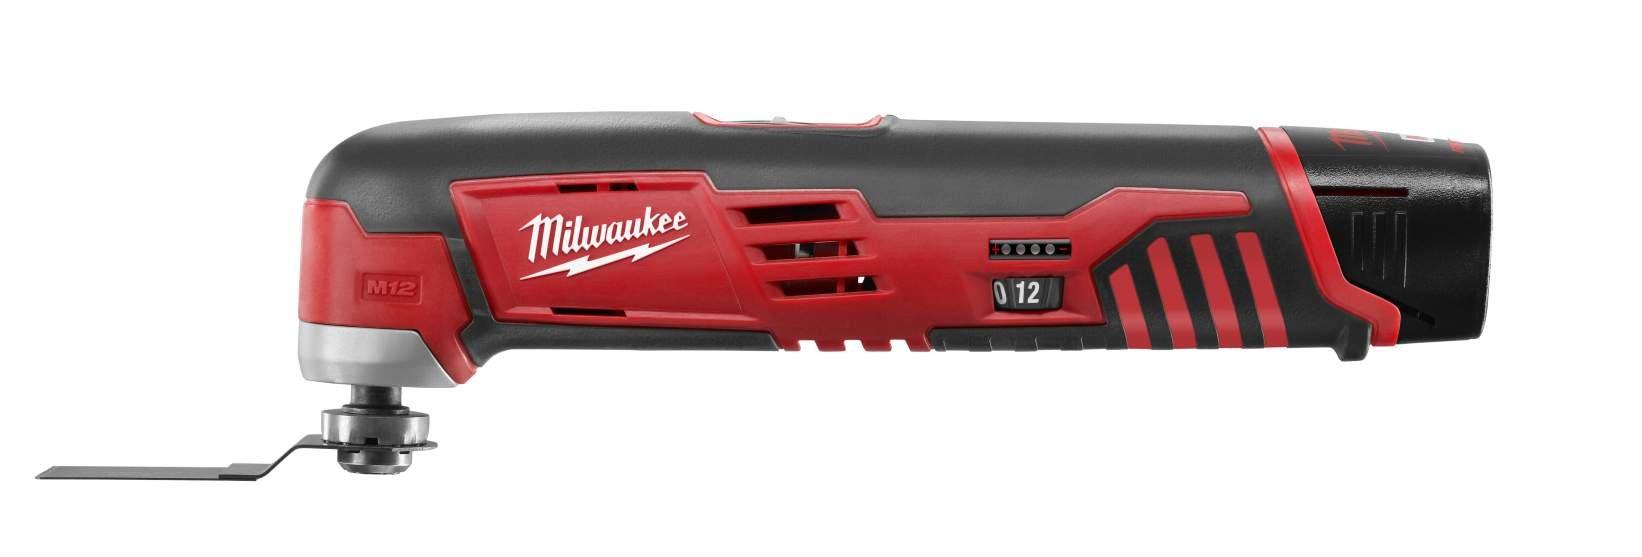 Milwaukee 2426 21 Cordless Lithium Ion Multi Tool